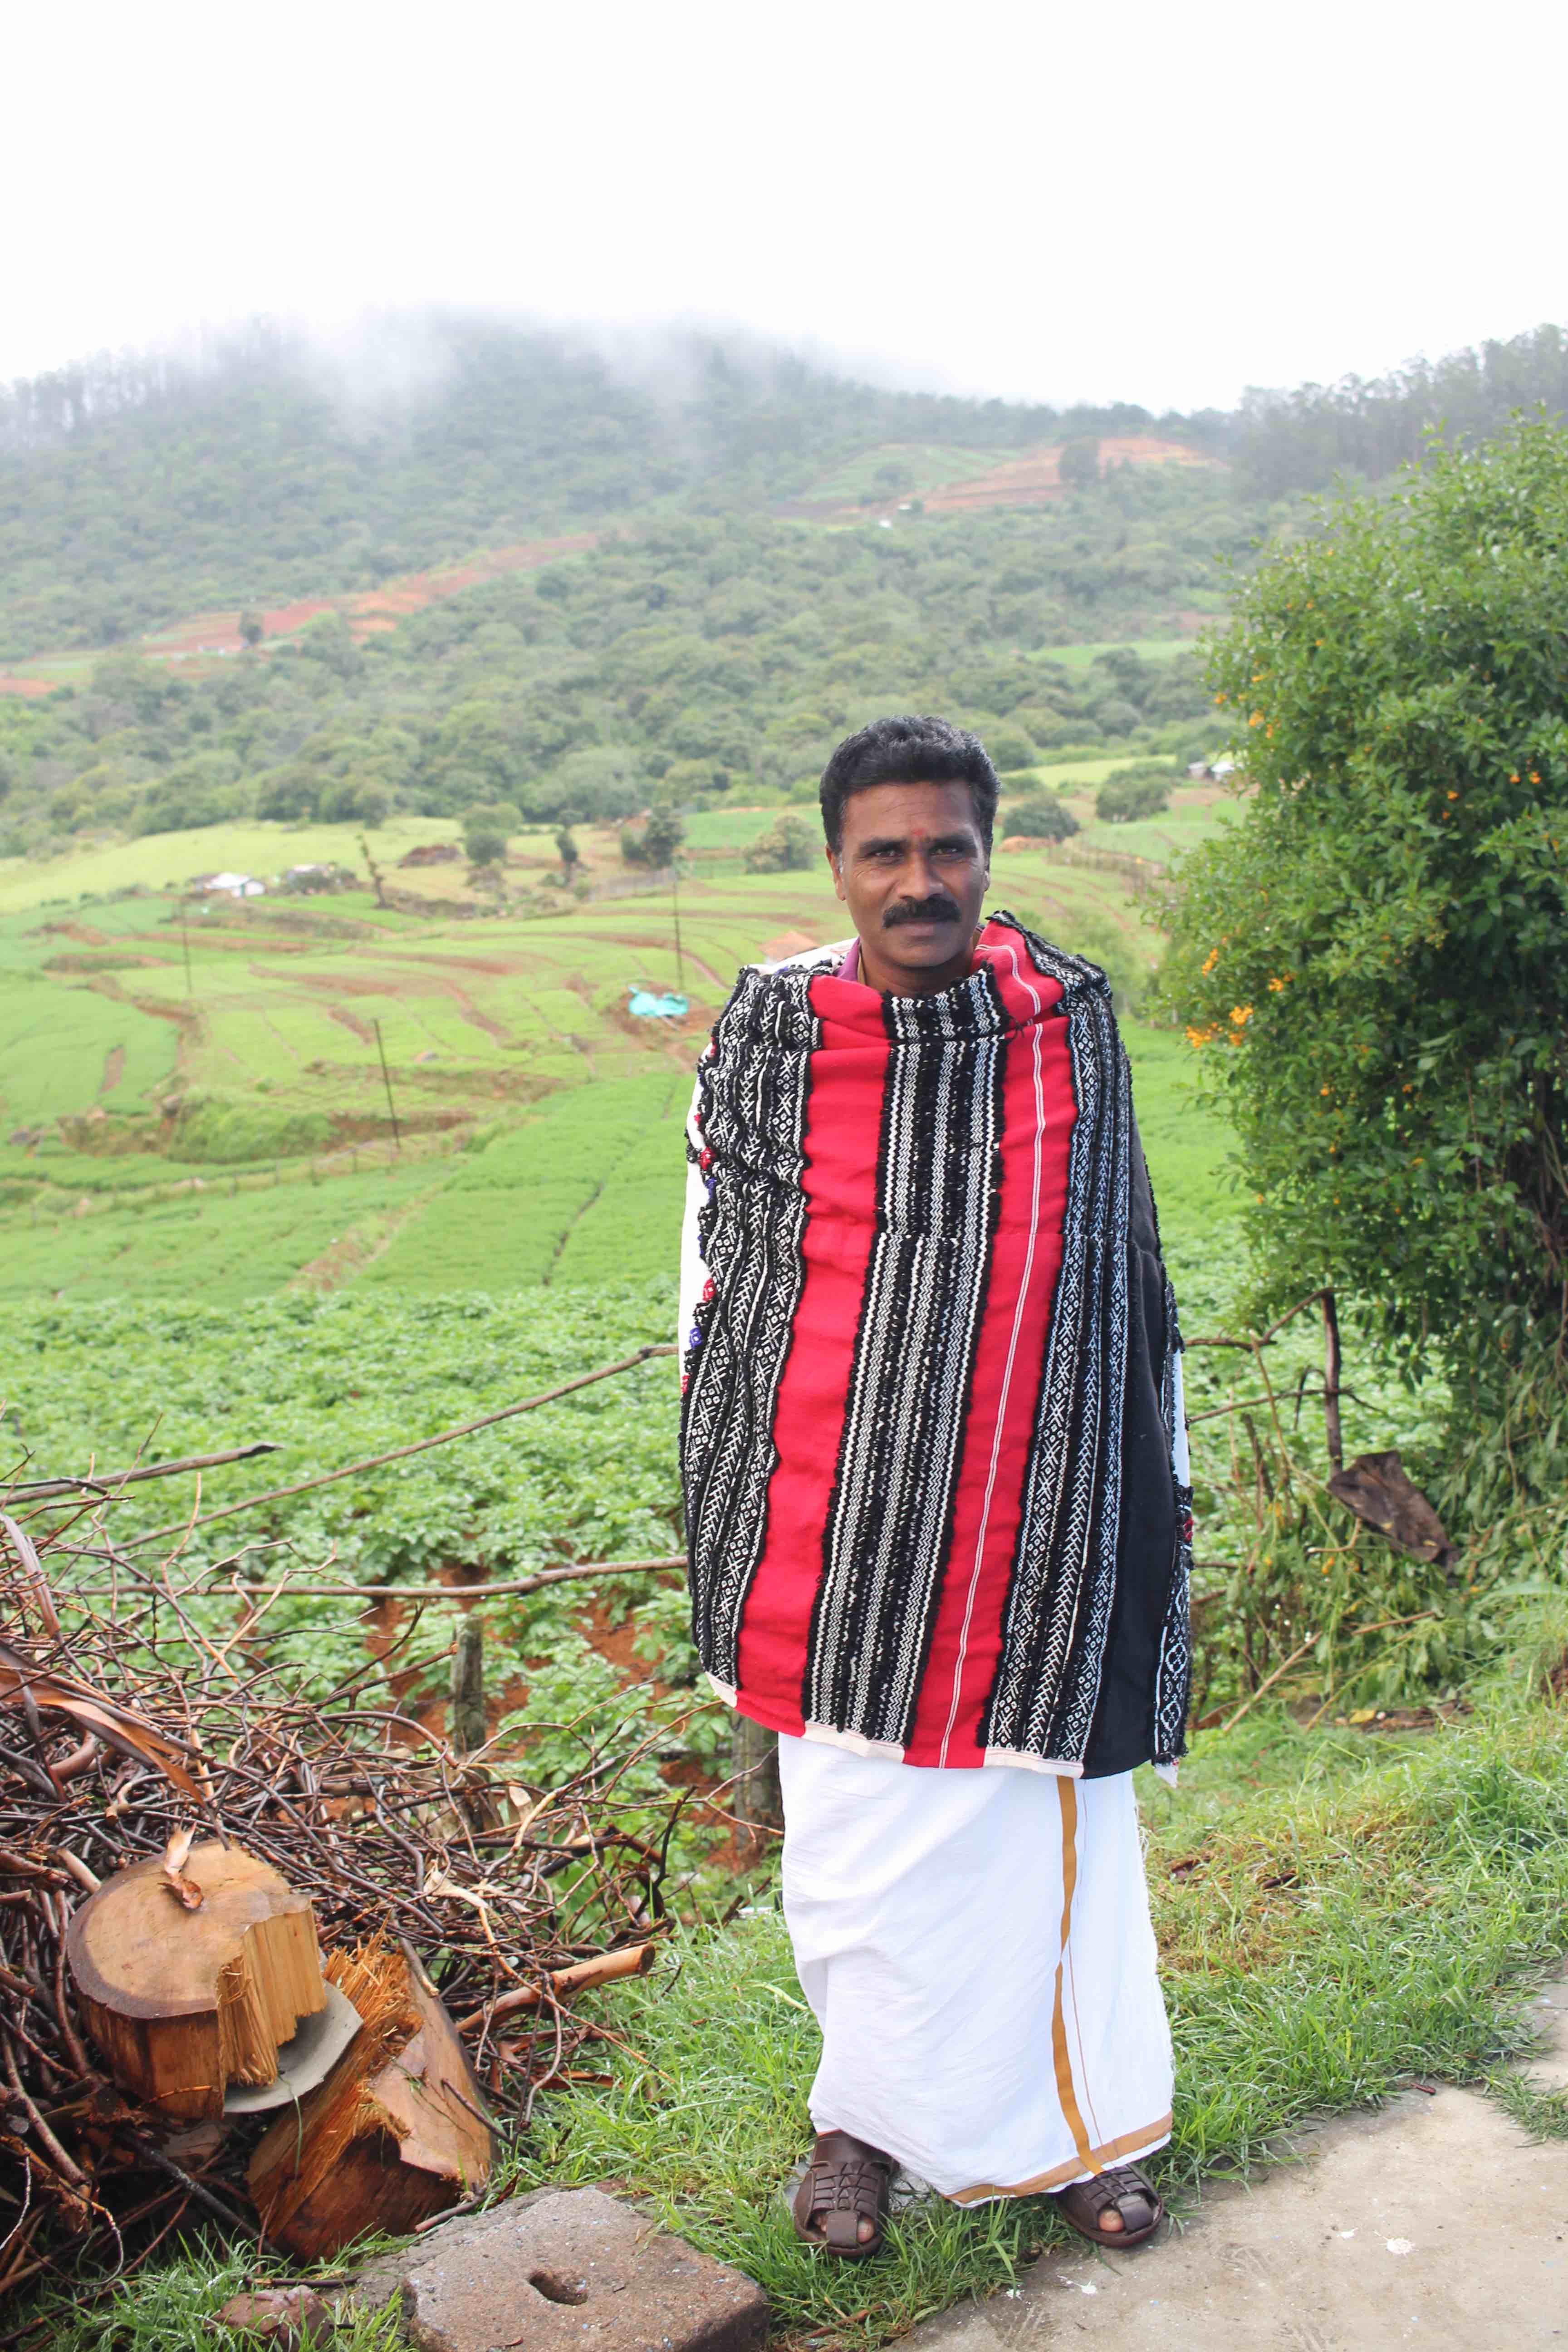 A Toda man in his traditional attire near Ooty. Credit: Sibi Arasu